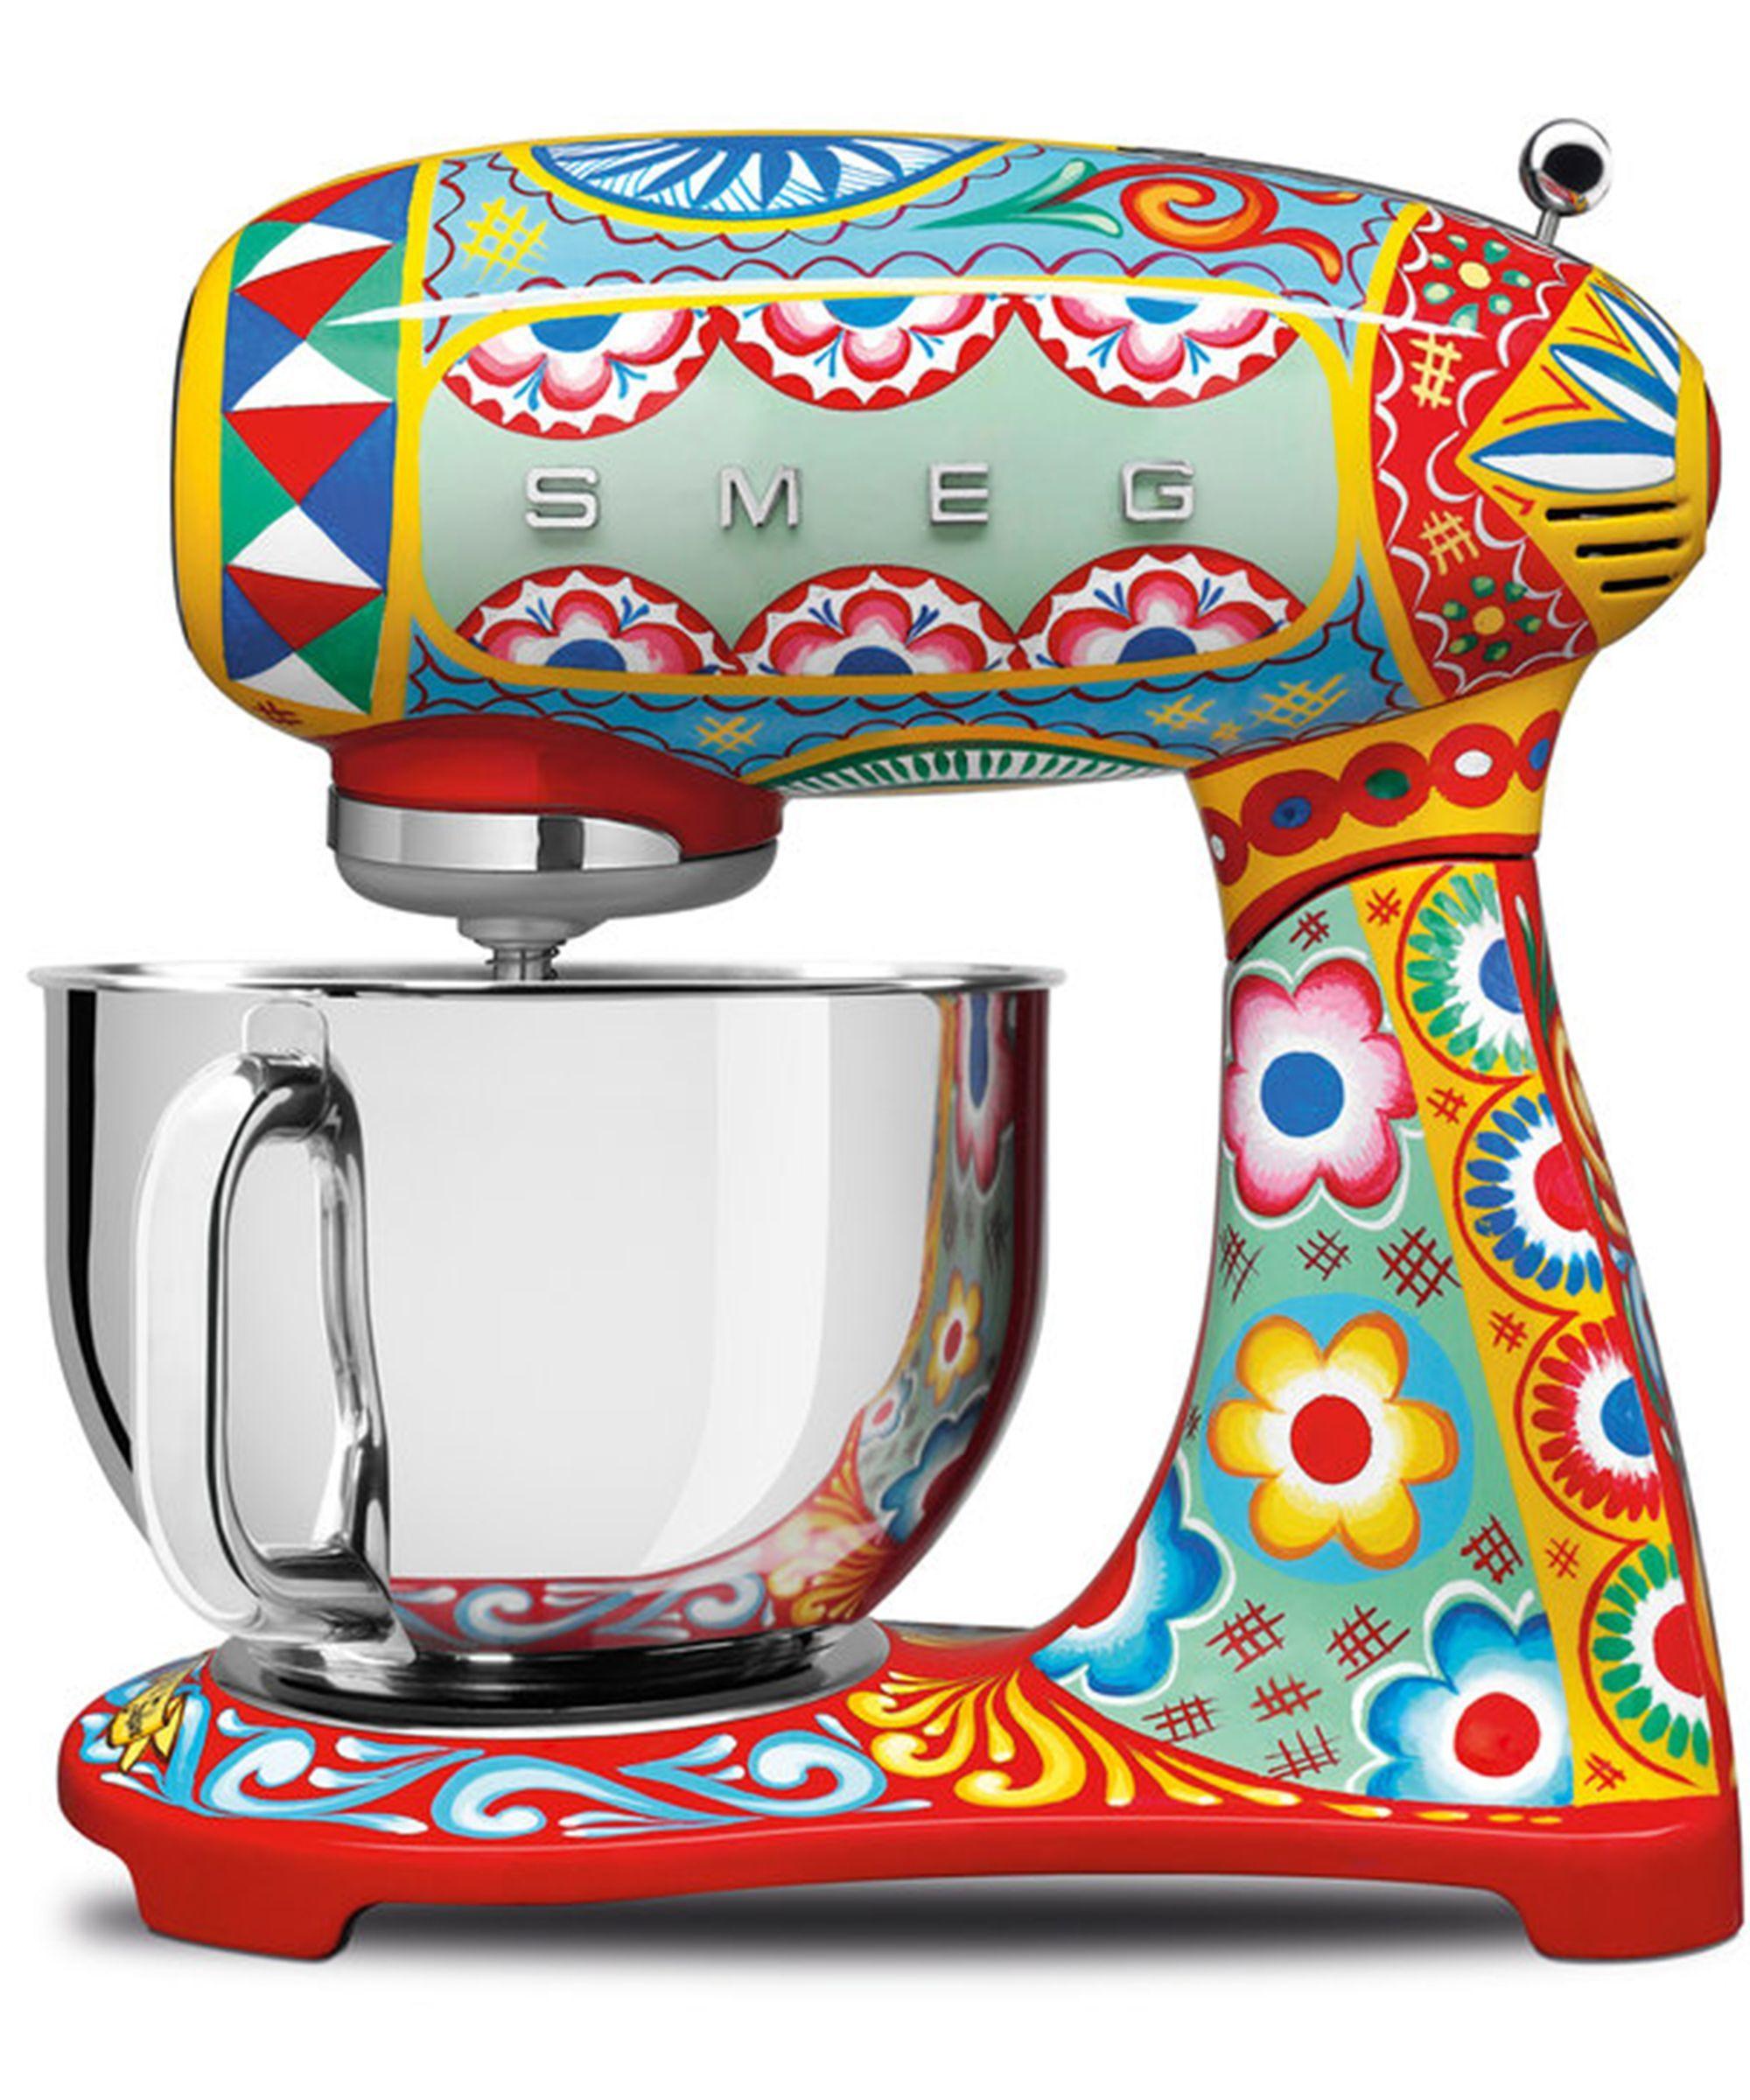 Dolce U0026 Gabbana Is Releasing A Line Of Kitchen Appliances U0026 We Want Them All